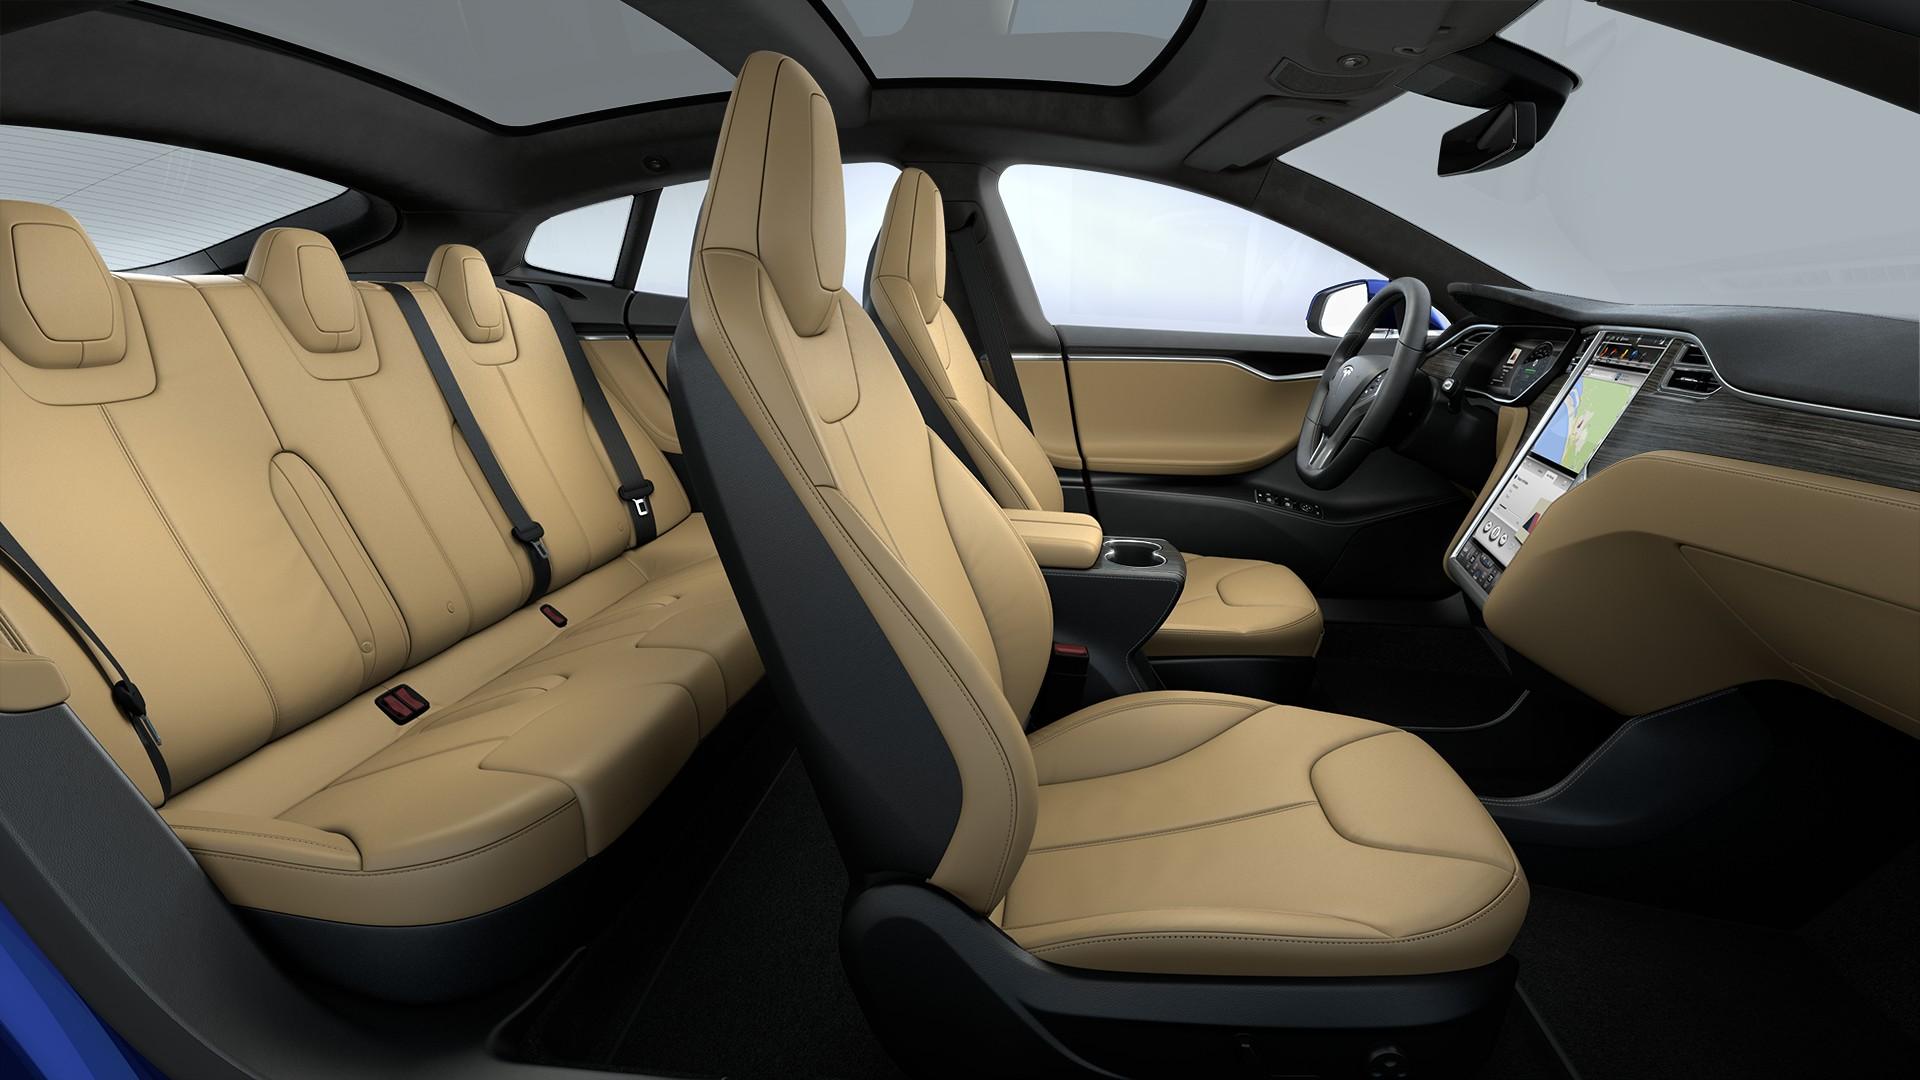 Interieur Matte Obeche Wood Decor Extended Nappa Leather Trim Black Alcantara Headliner Alcantara Dashboard Accents